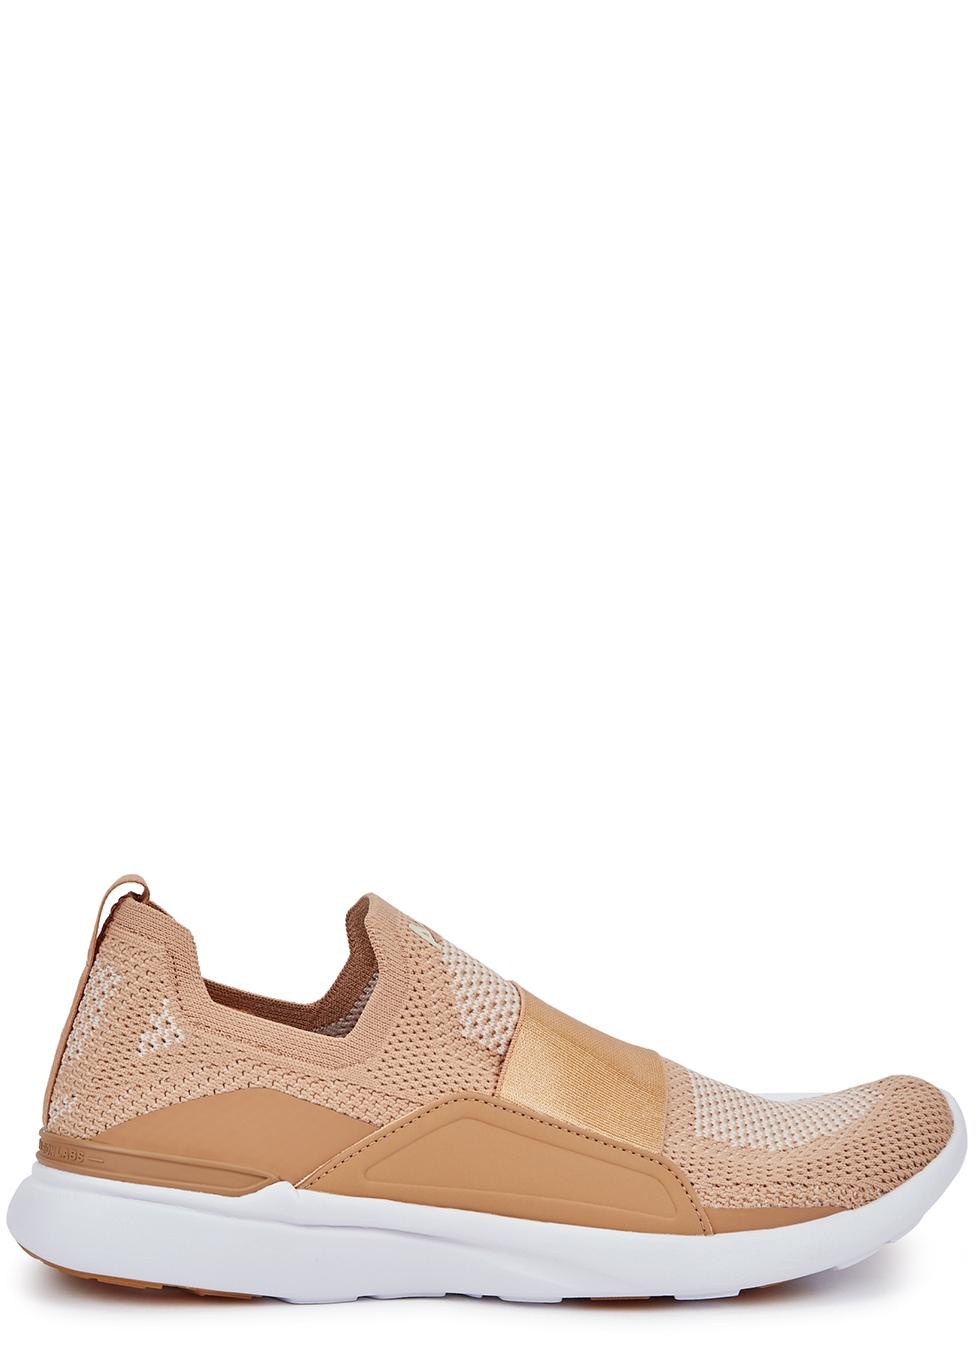 Techloom Bliss camel stretch-knit sneakers